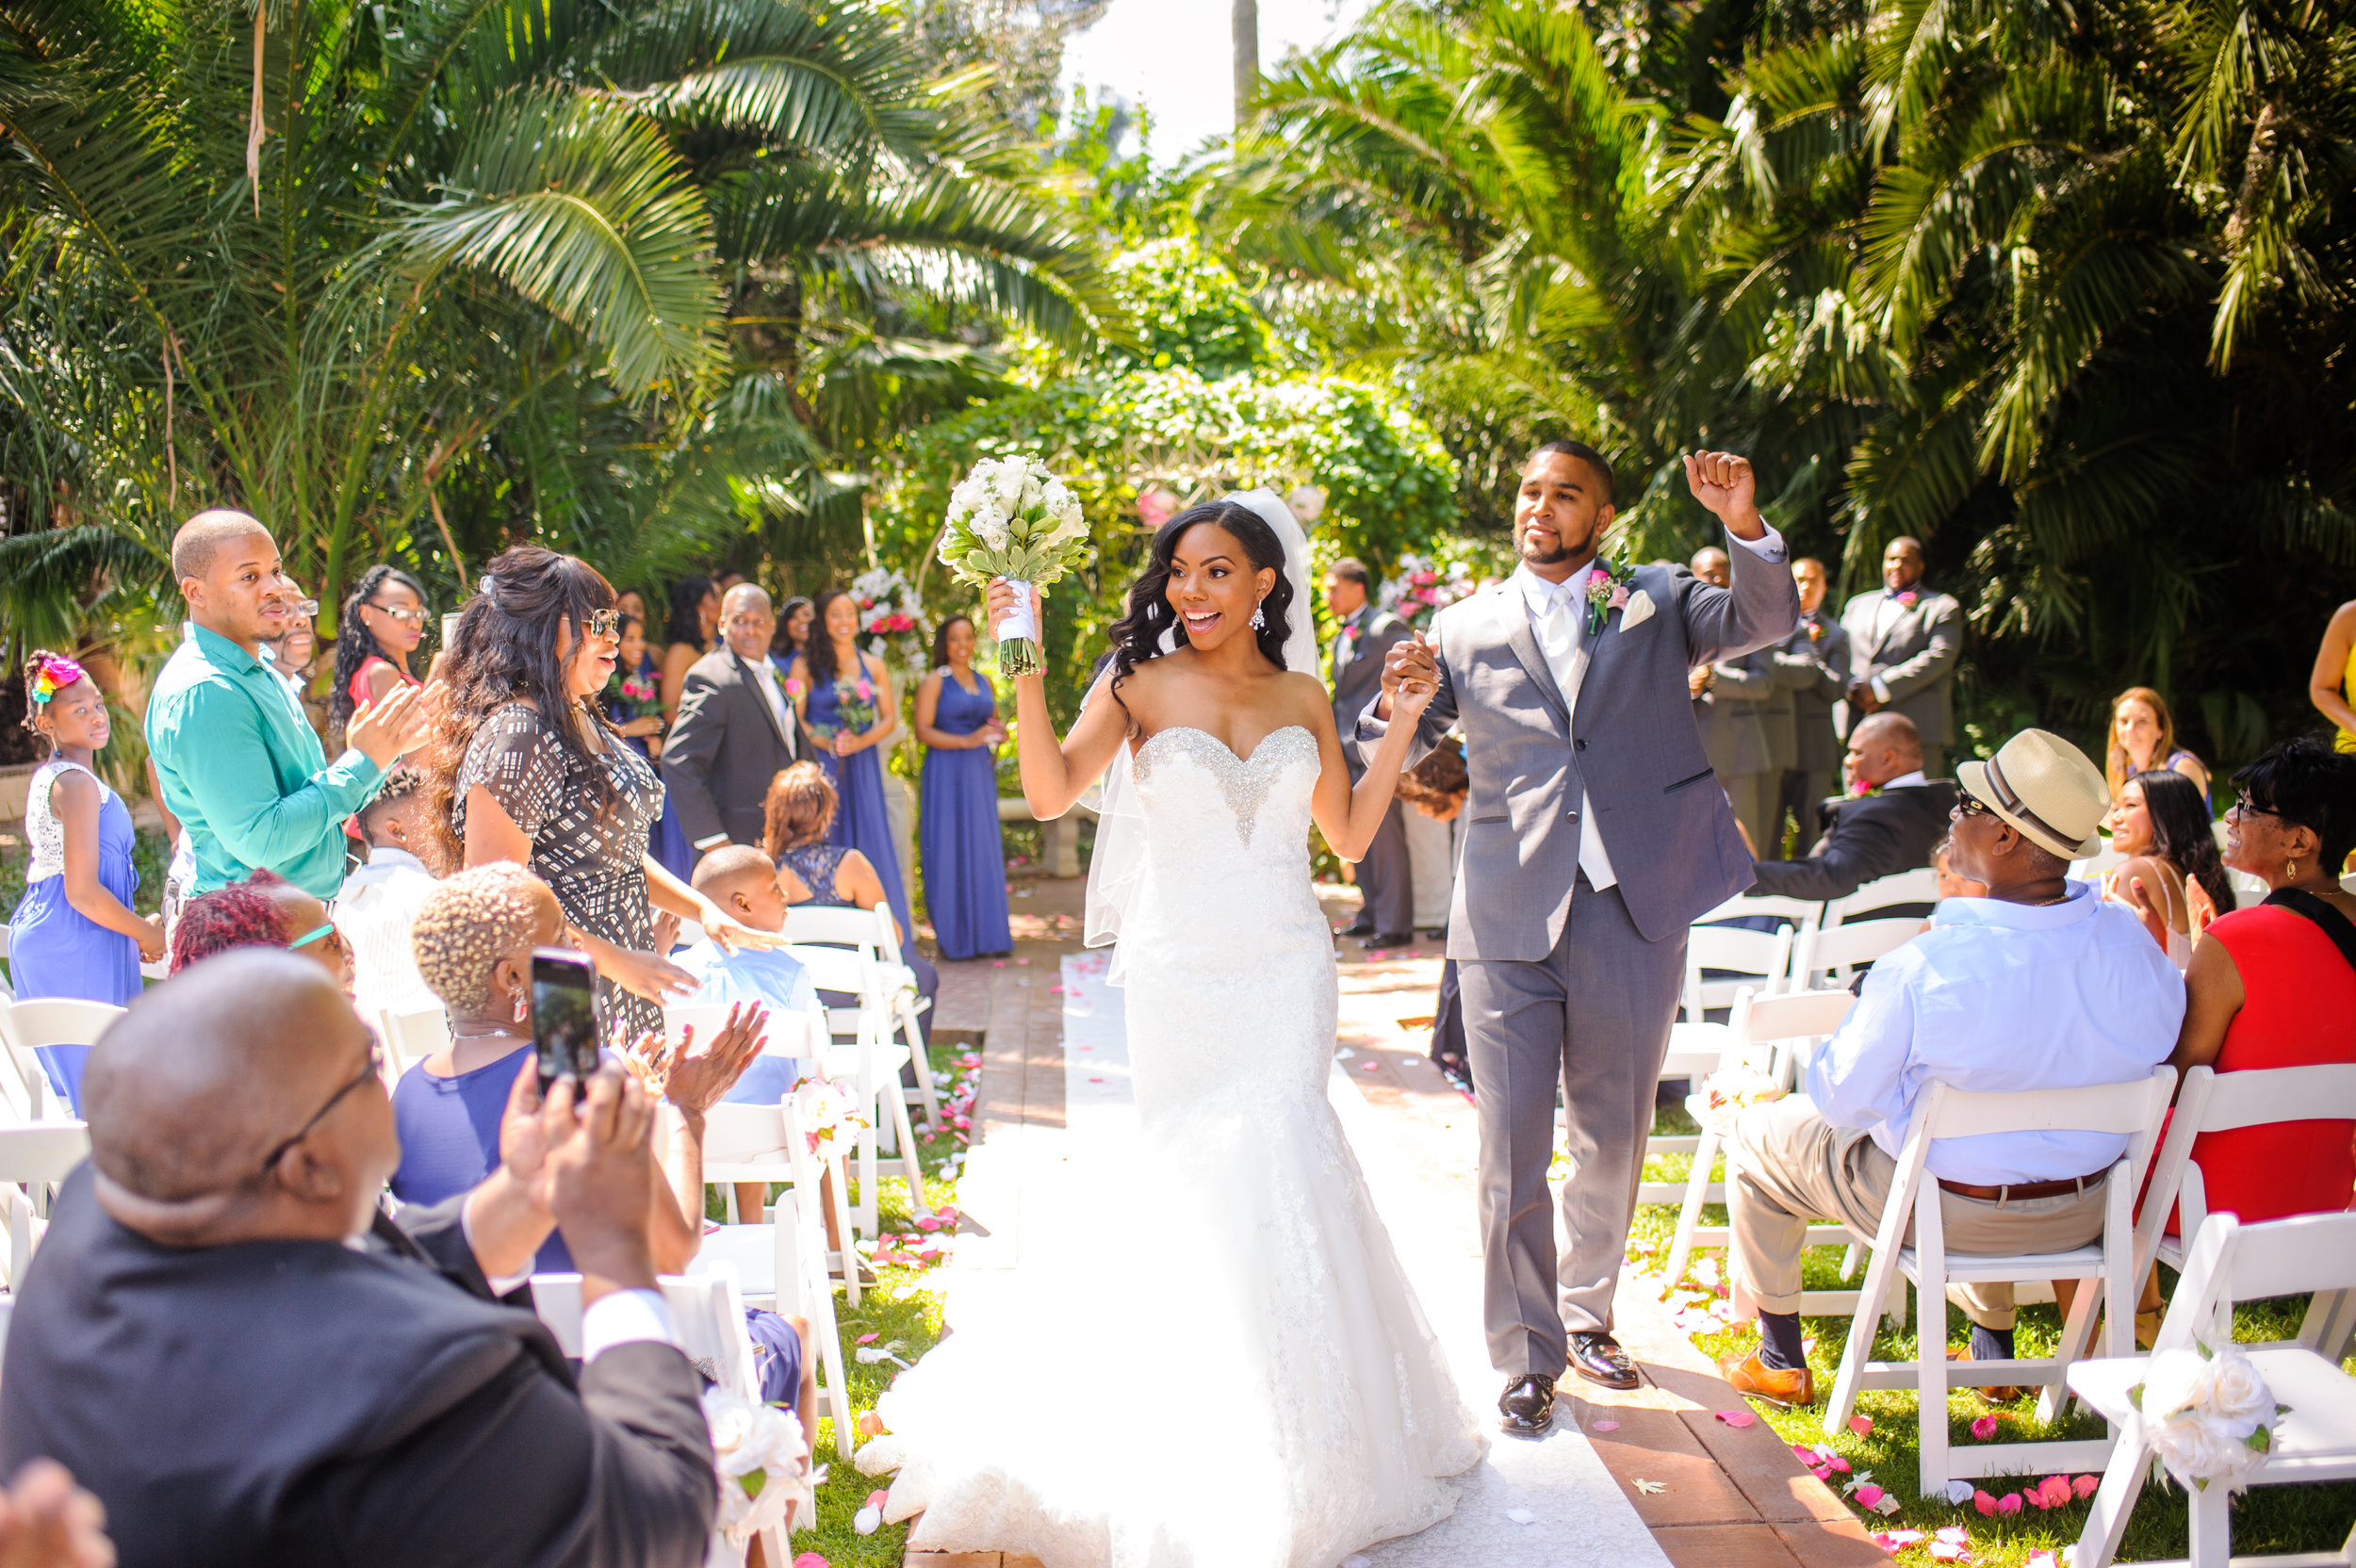 trina-cj-028-grand-island-mansion-sacramento-wedding-photographer-katherine-nicole-photography.JPG